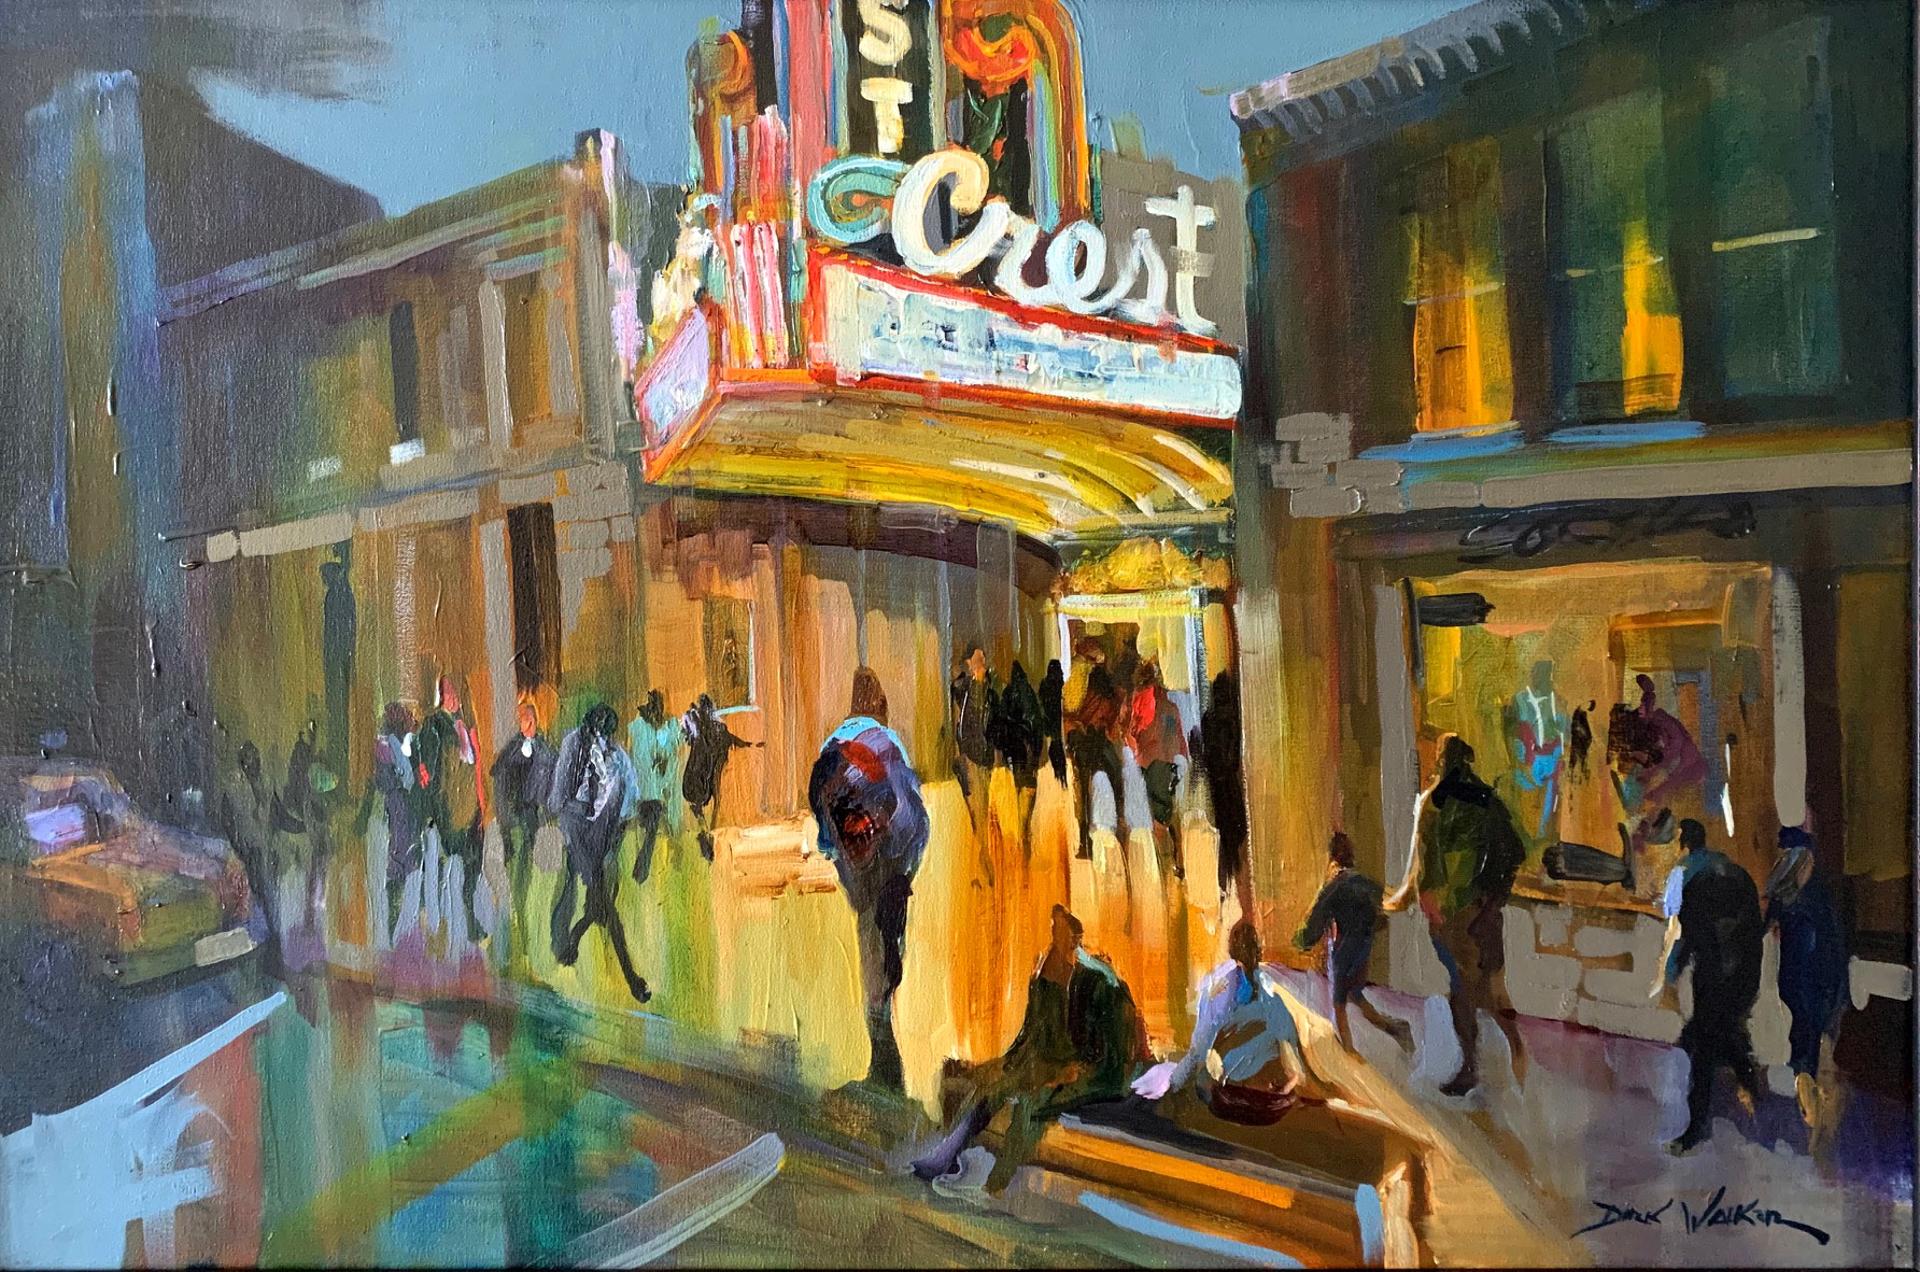 The Crest Theatre by Dirk Walker